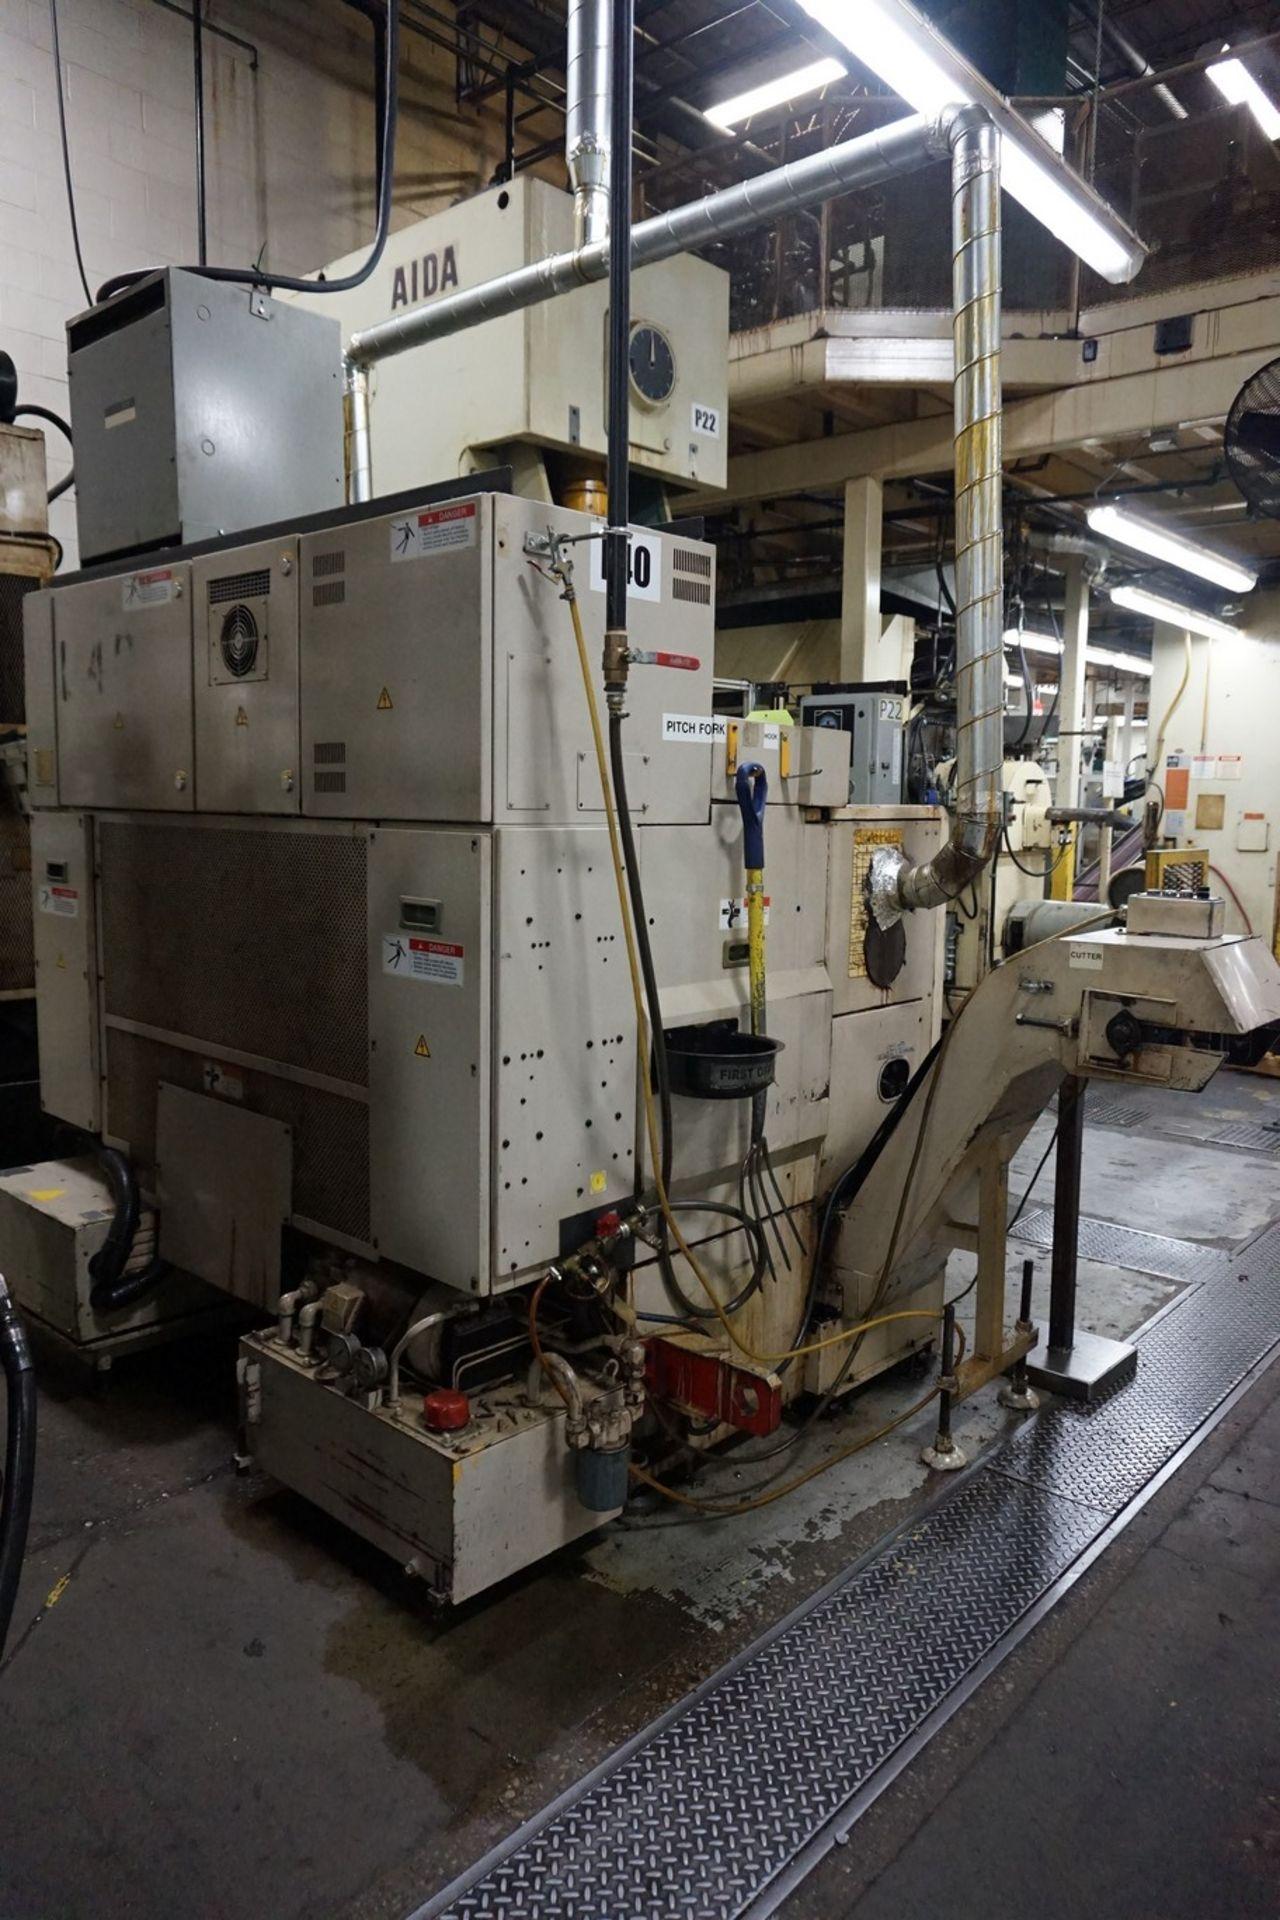 Okuma-Howa Model 2SP-15H CNC Lathe c/w Fanuc 18-TT Controller, Transformer - Image 4 of 6